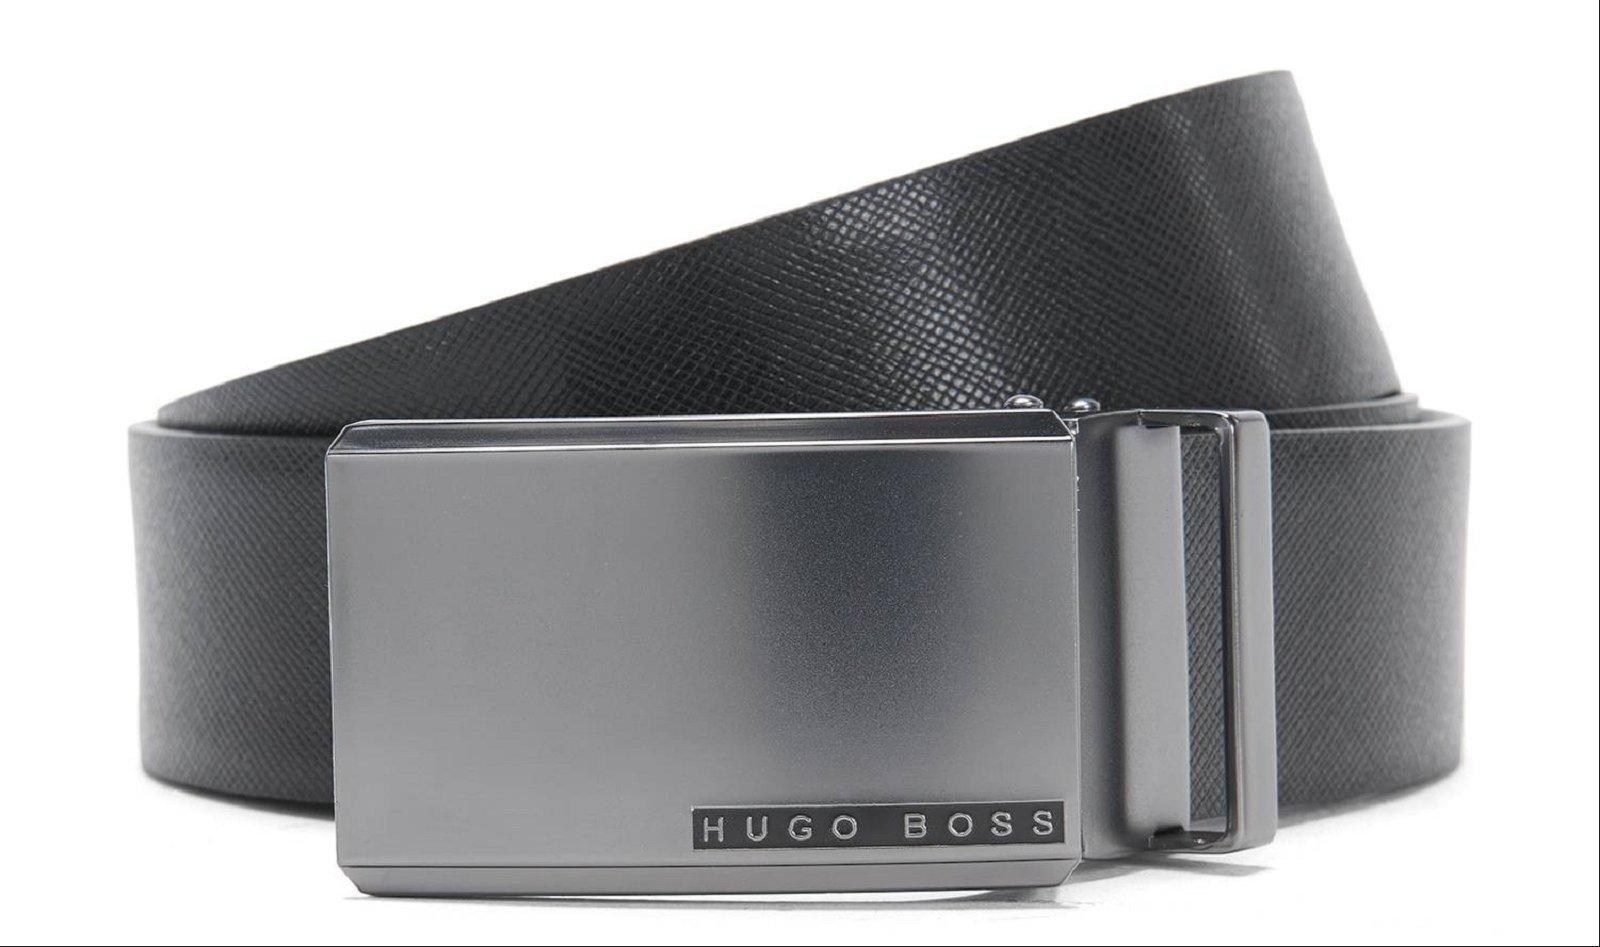 81bb8ee415e HUGO BOSS Coffret ceinture avec 2 boucles - 50327643